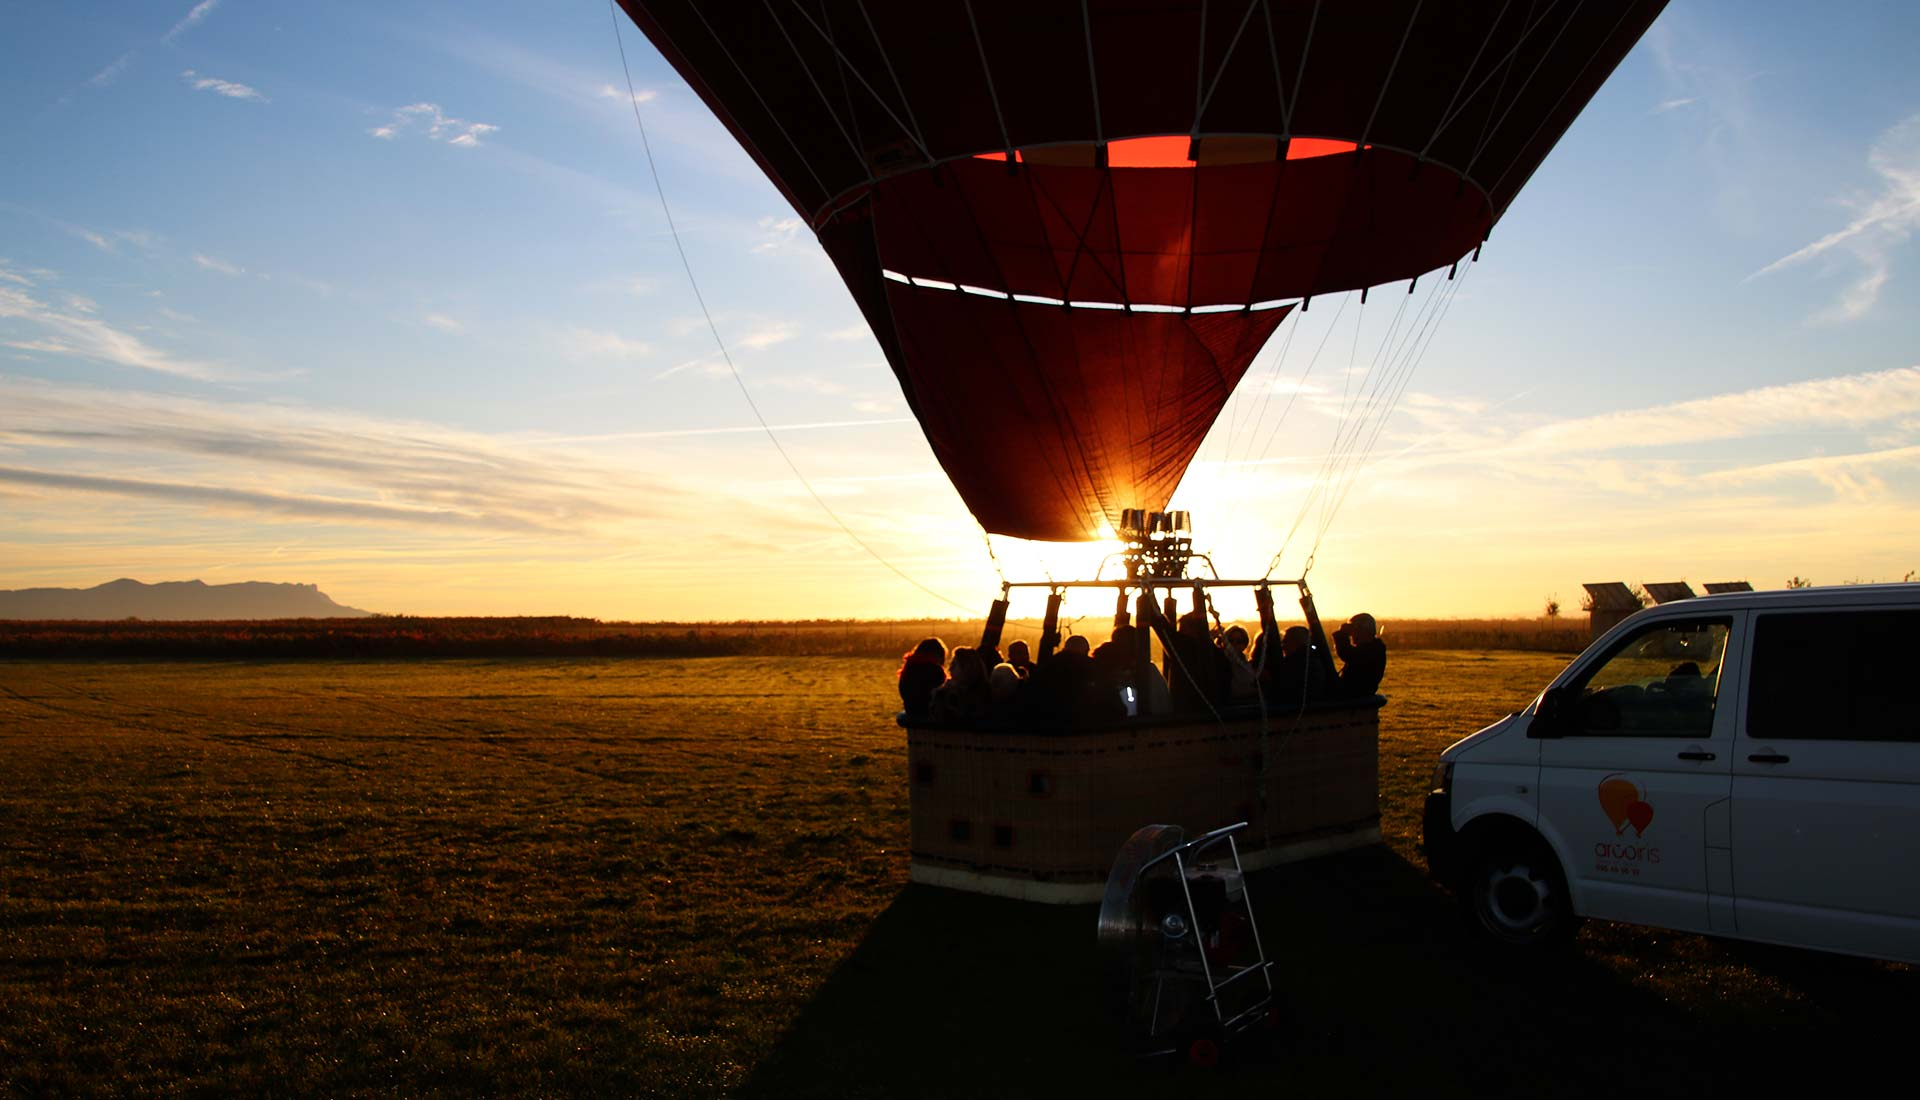 vuelo en globo arcoiris 44 min